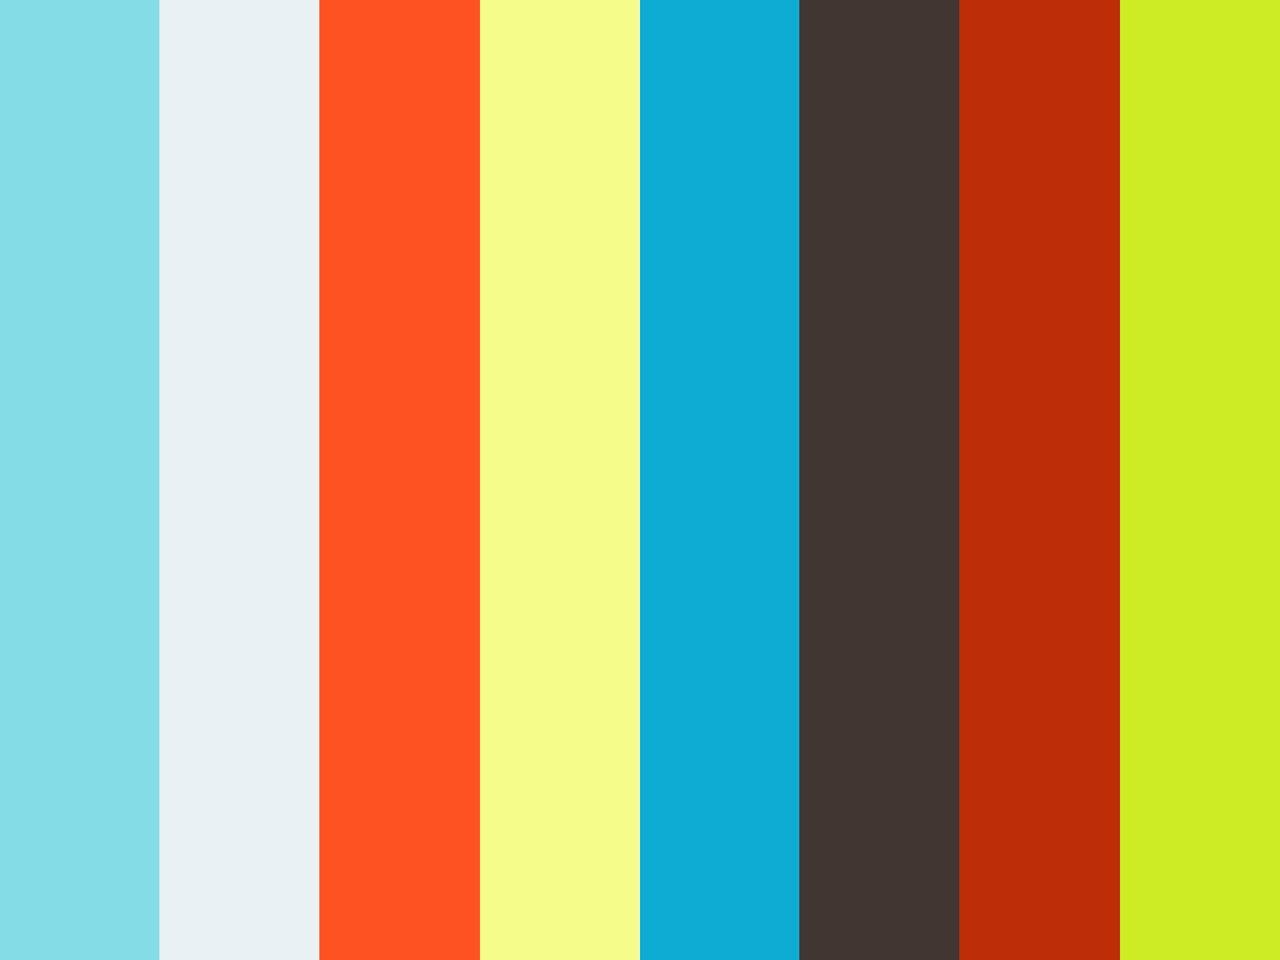 Zumanjaro -  Drop of doom - 6 Flags